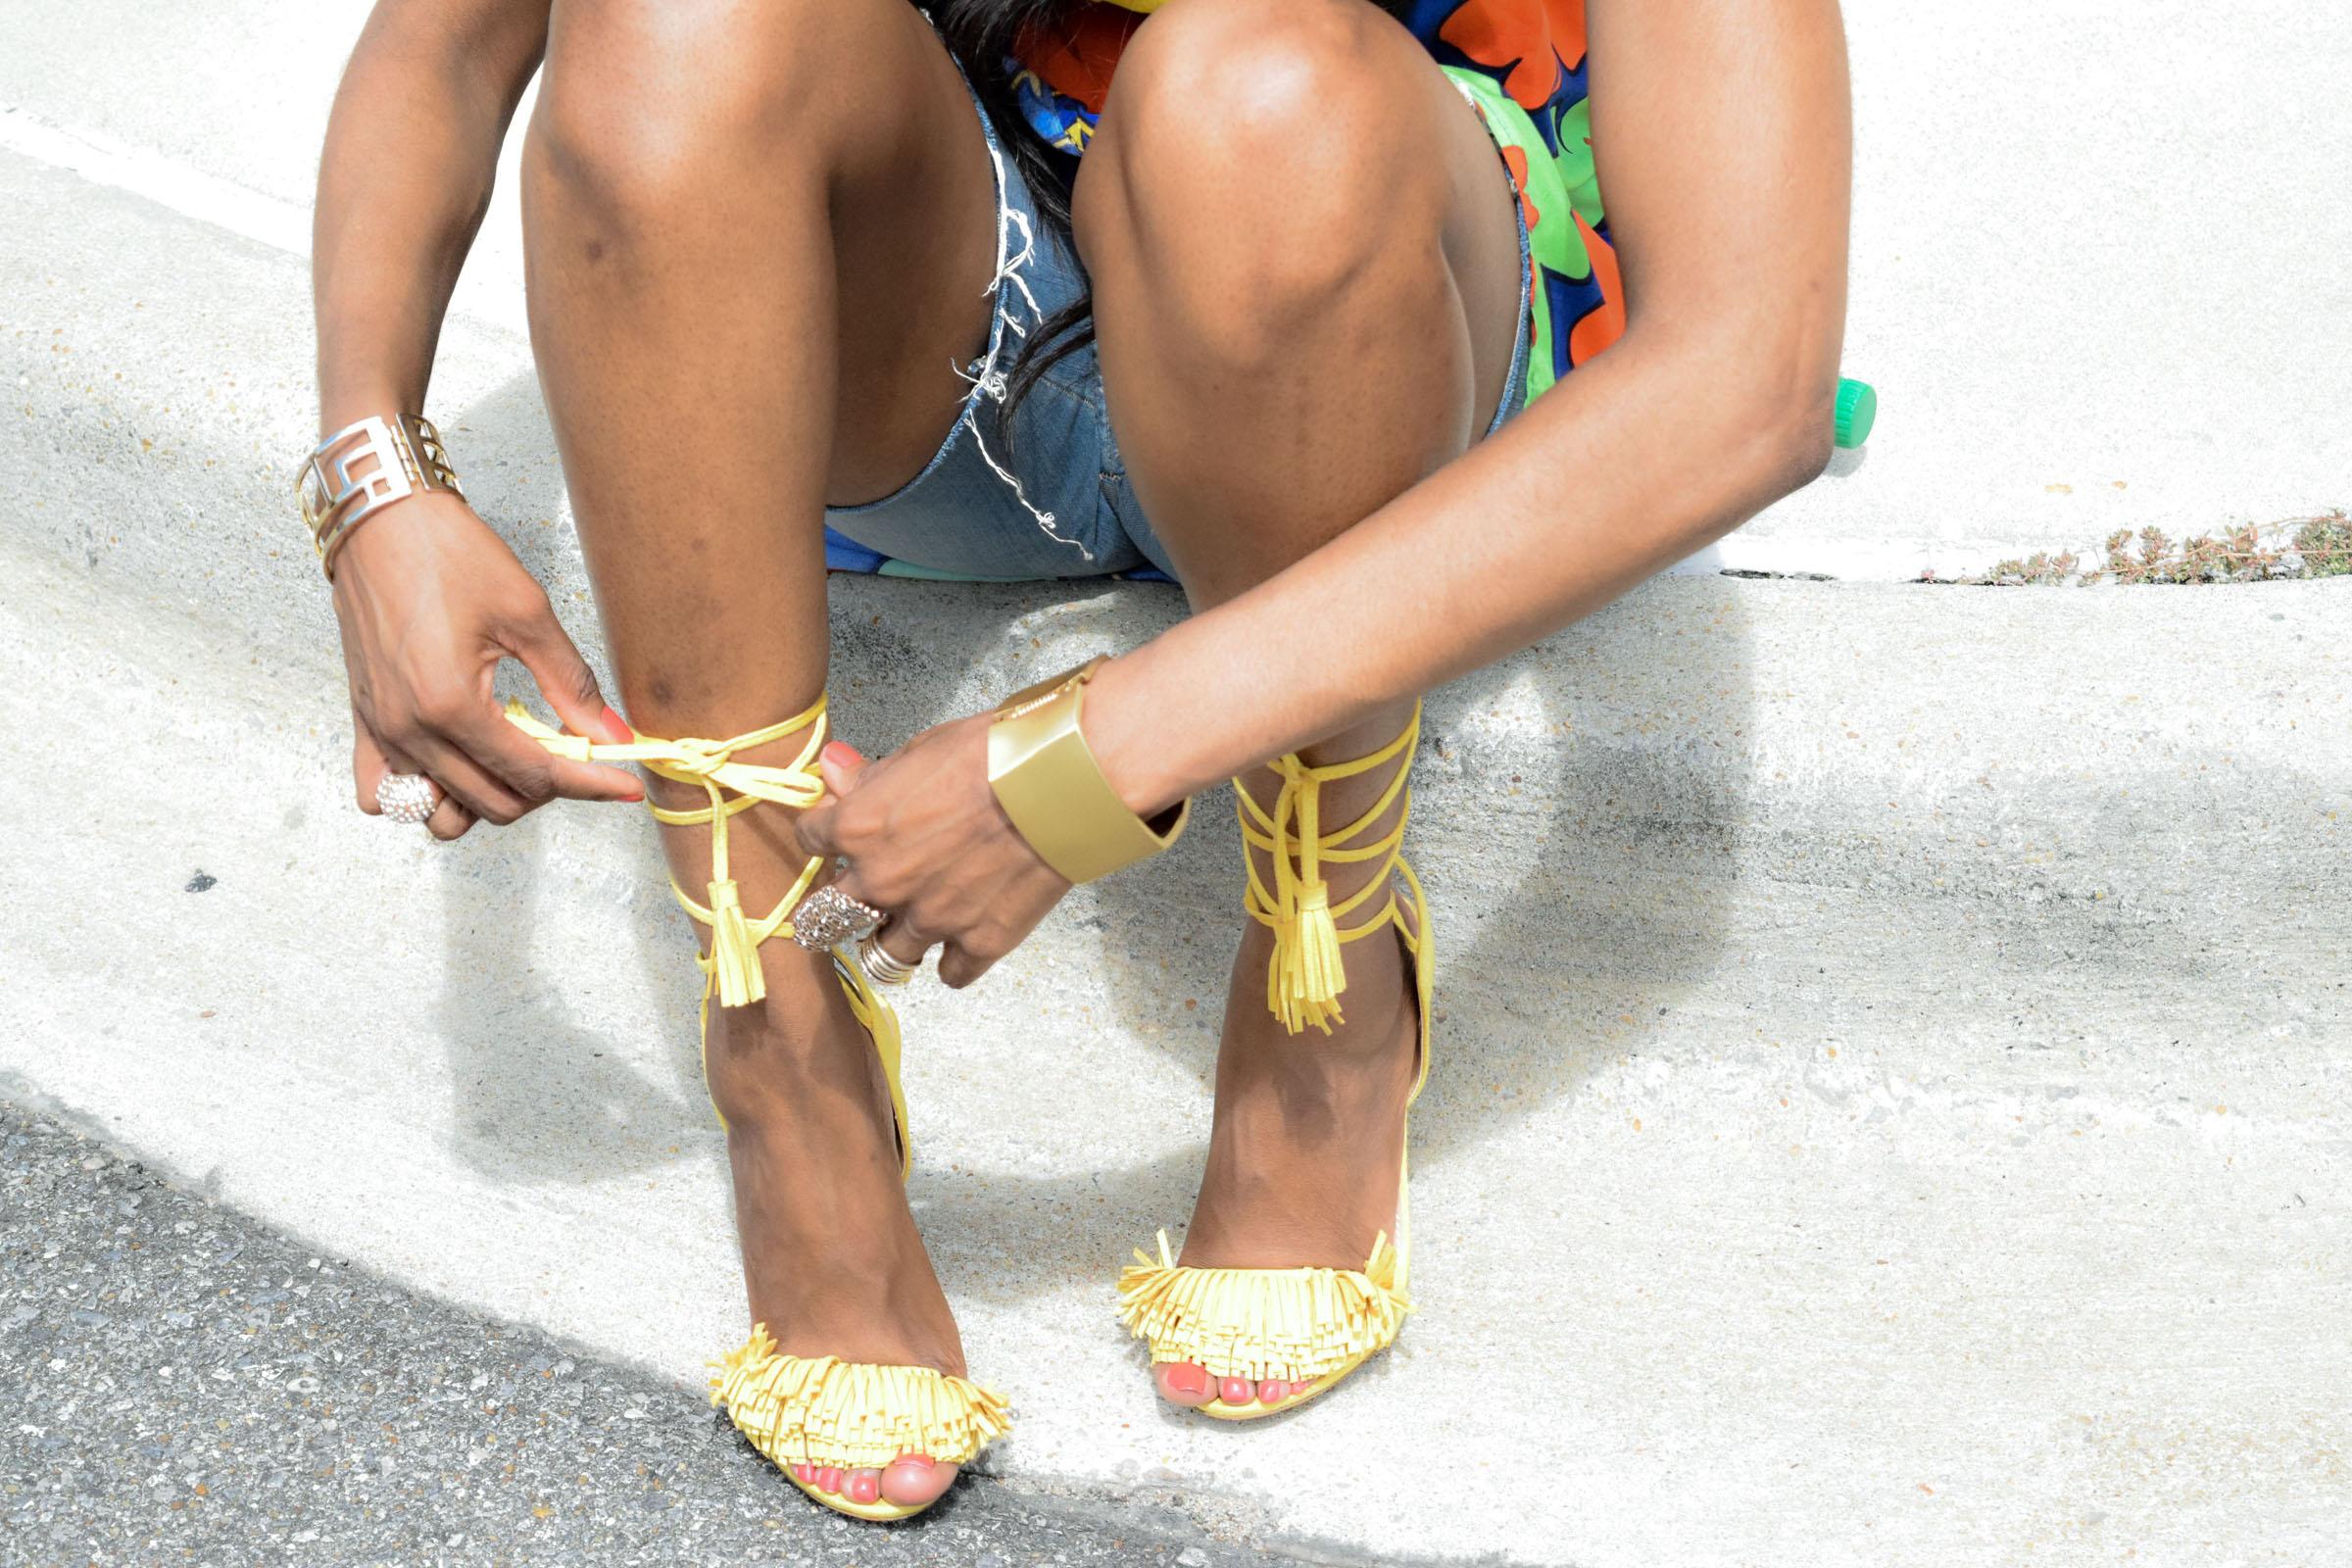 Style-Files-Target-Marimeko-collection -floral-tunic-justfab-tayrey-yellow-fringe-heels-sandals-yellow-turban-asos-denim-choker-oohlalablog-20